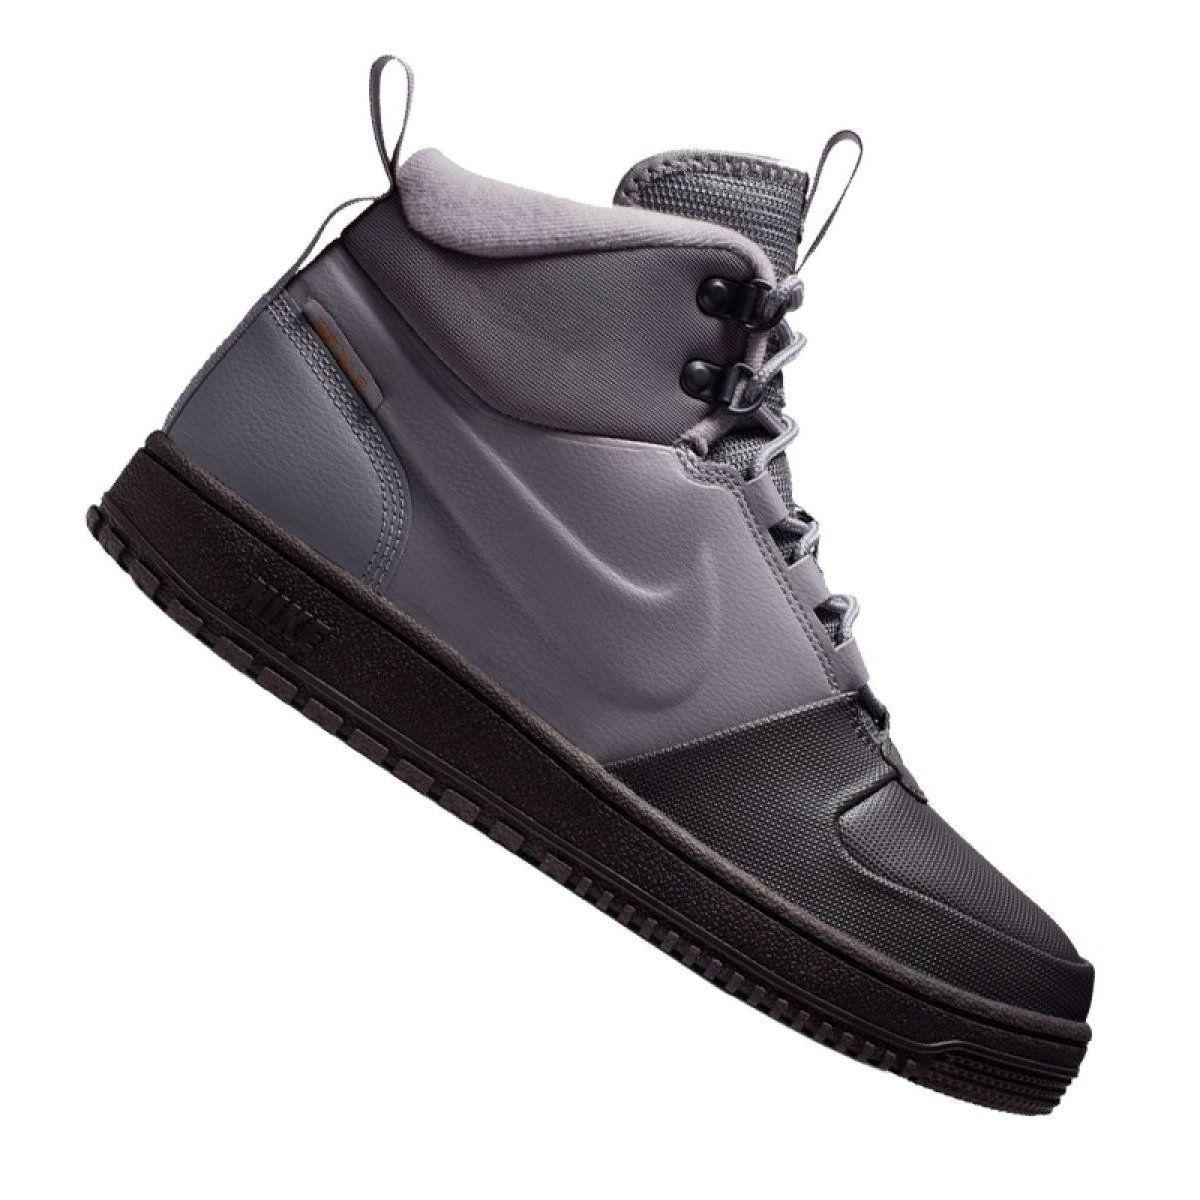 Buty Zimowe Nike Path Wntr M Bq4223 002 Szare All Black Sneakers Shoes Sneakers